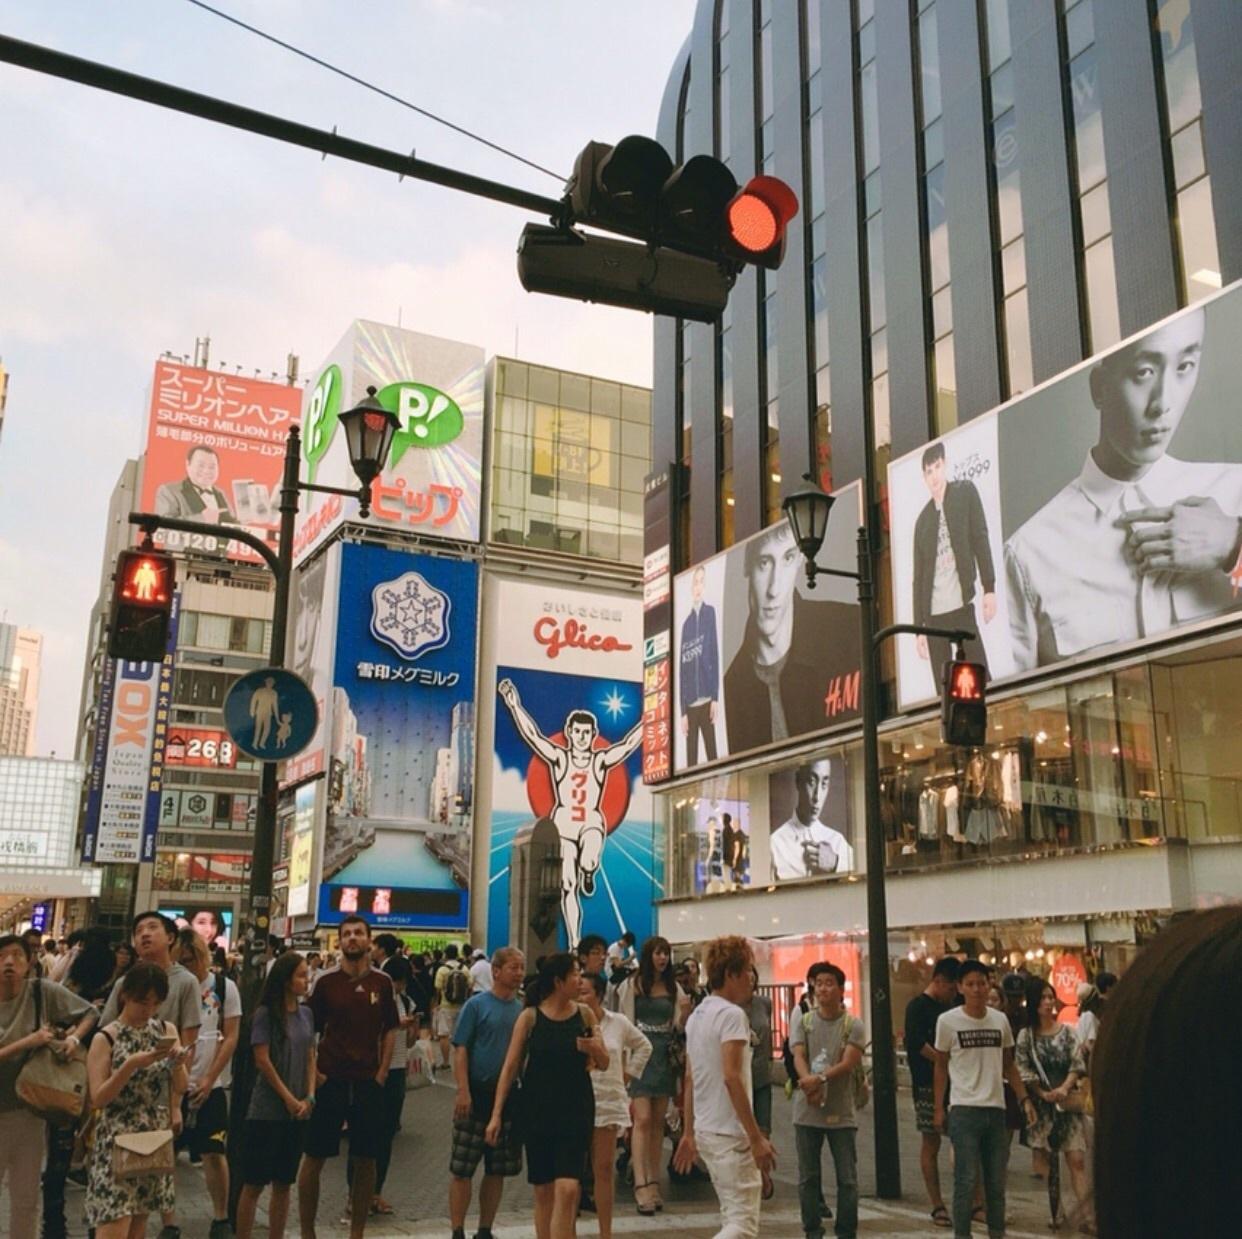 japan and osaka image